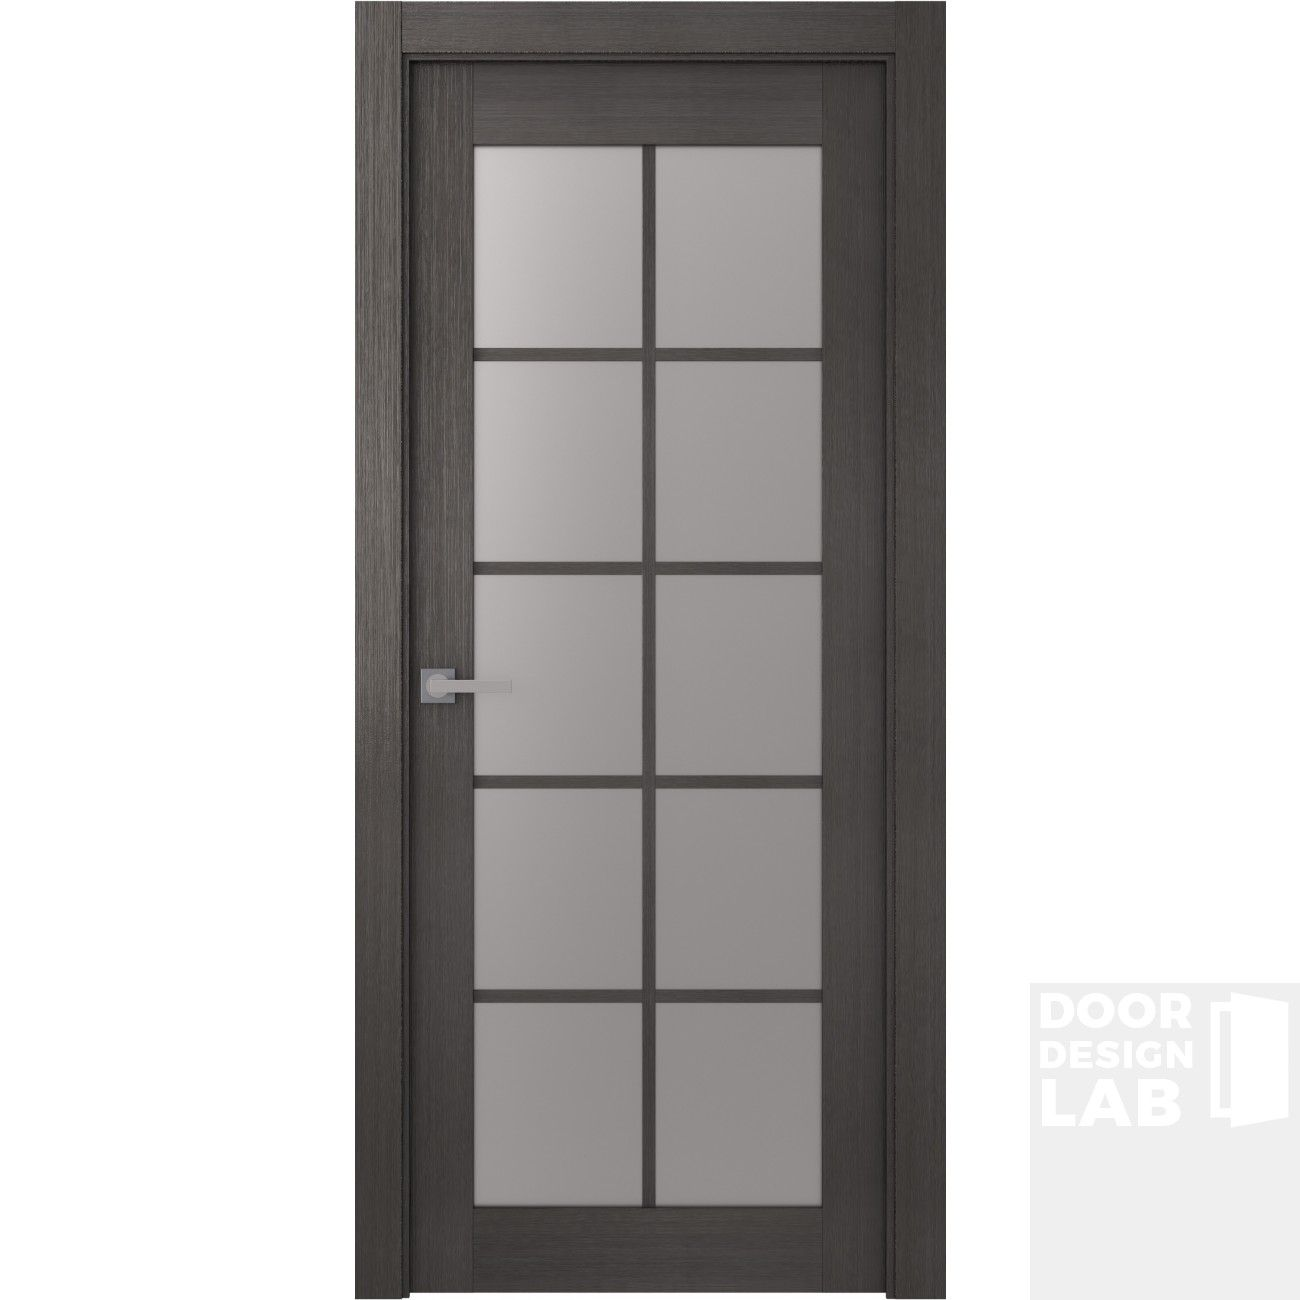 Avanti 10 Lite Vetro Black Apricot Belldinni Modern Interior Door Doors Interior Modern Sliding Closet Doors Doors Interior